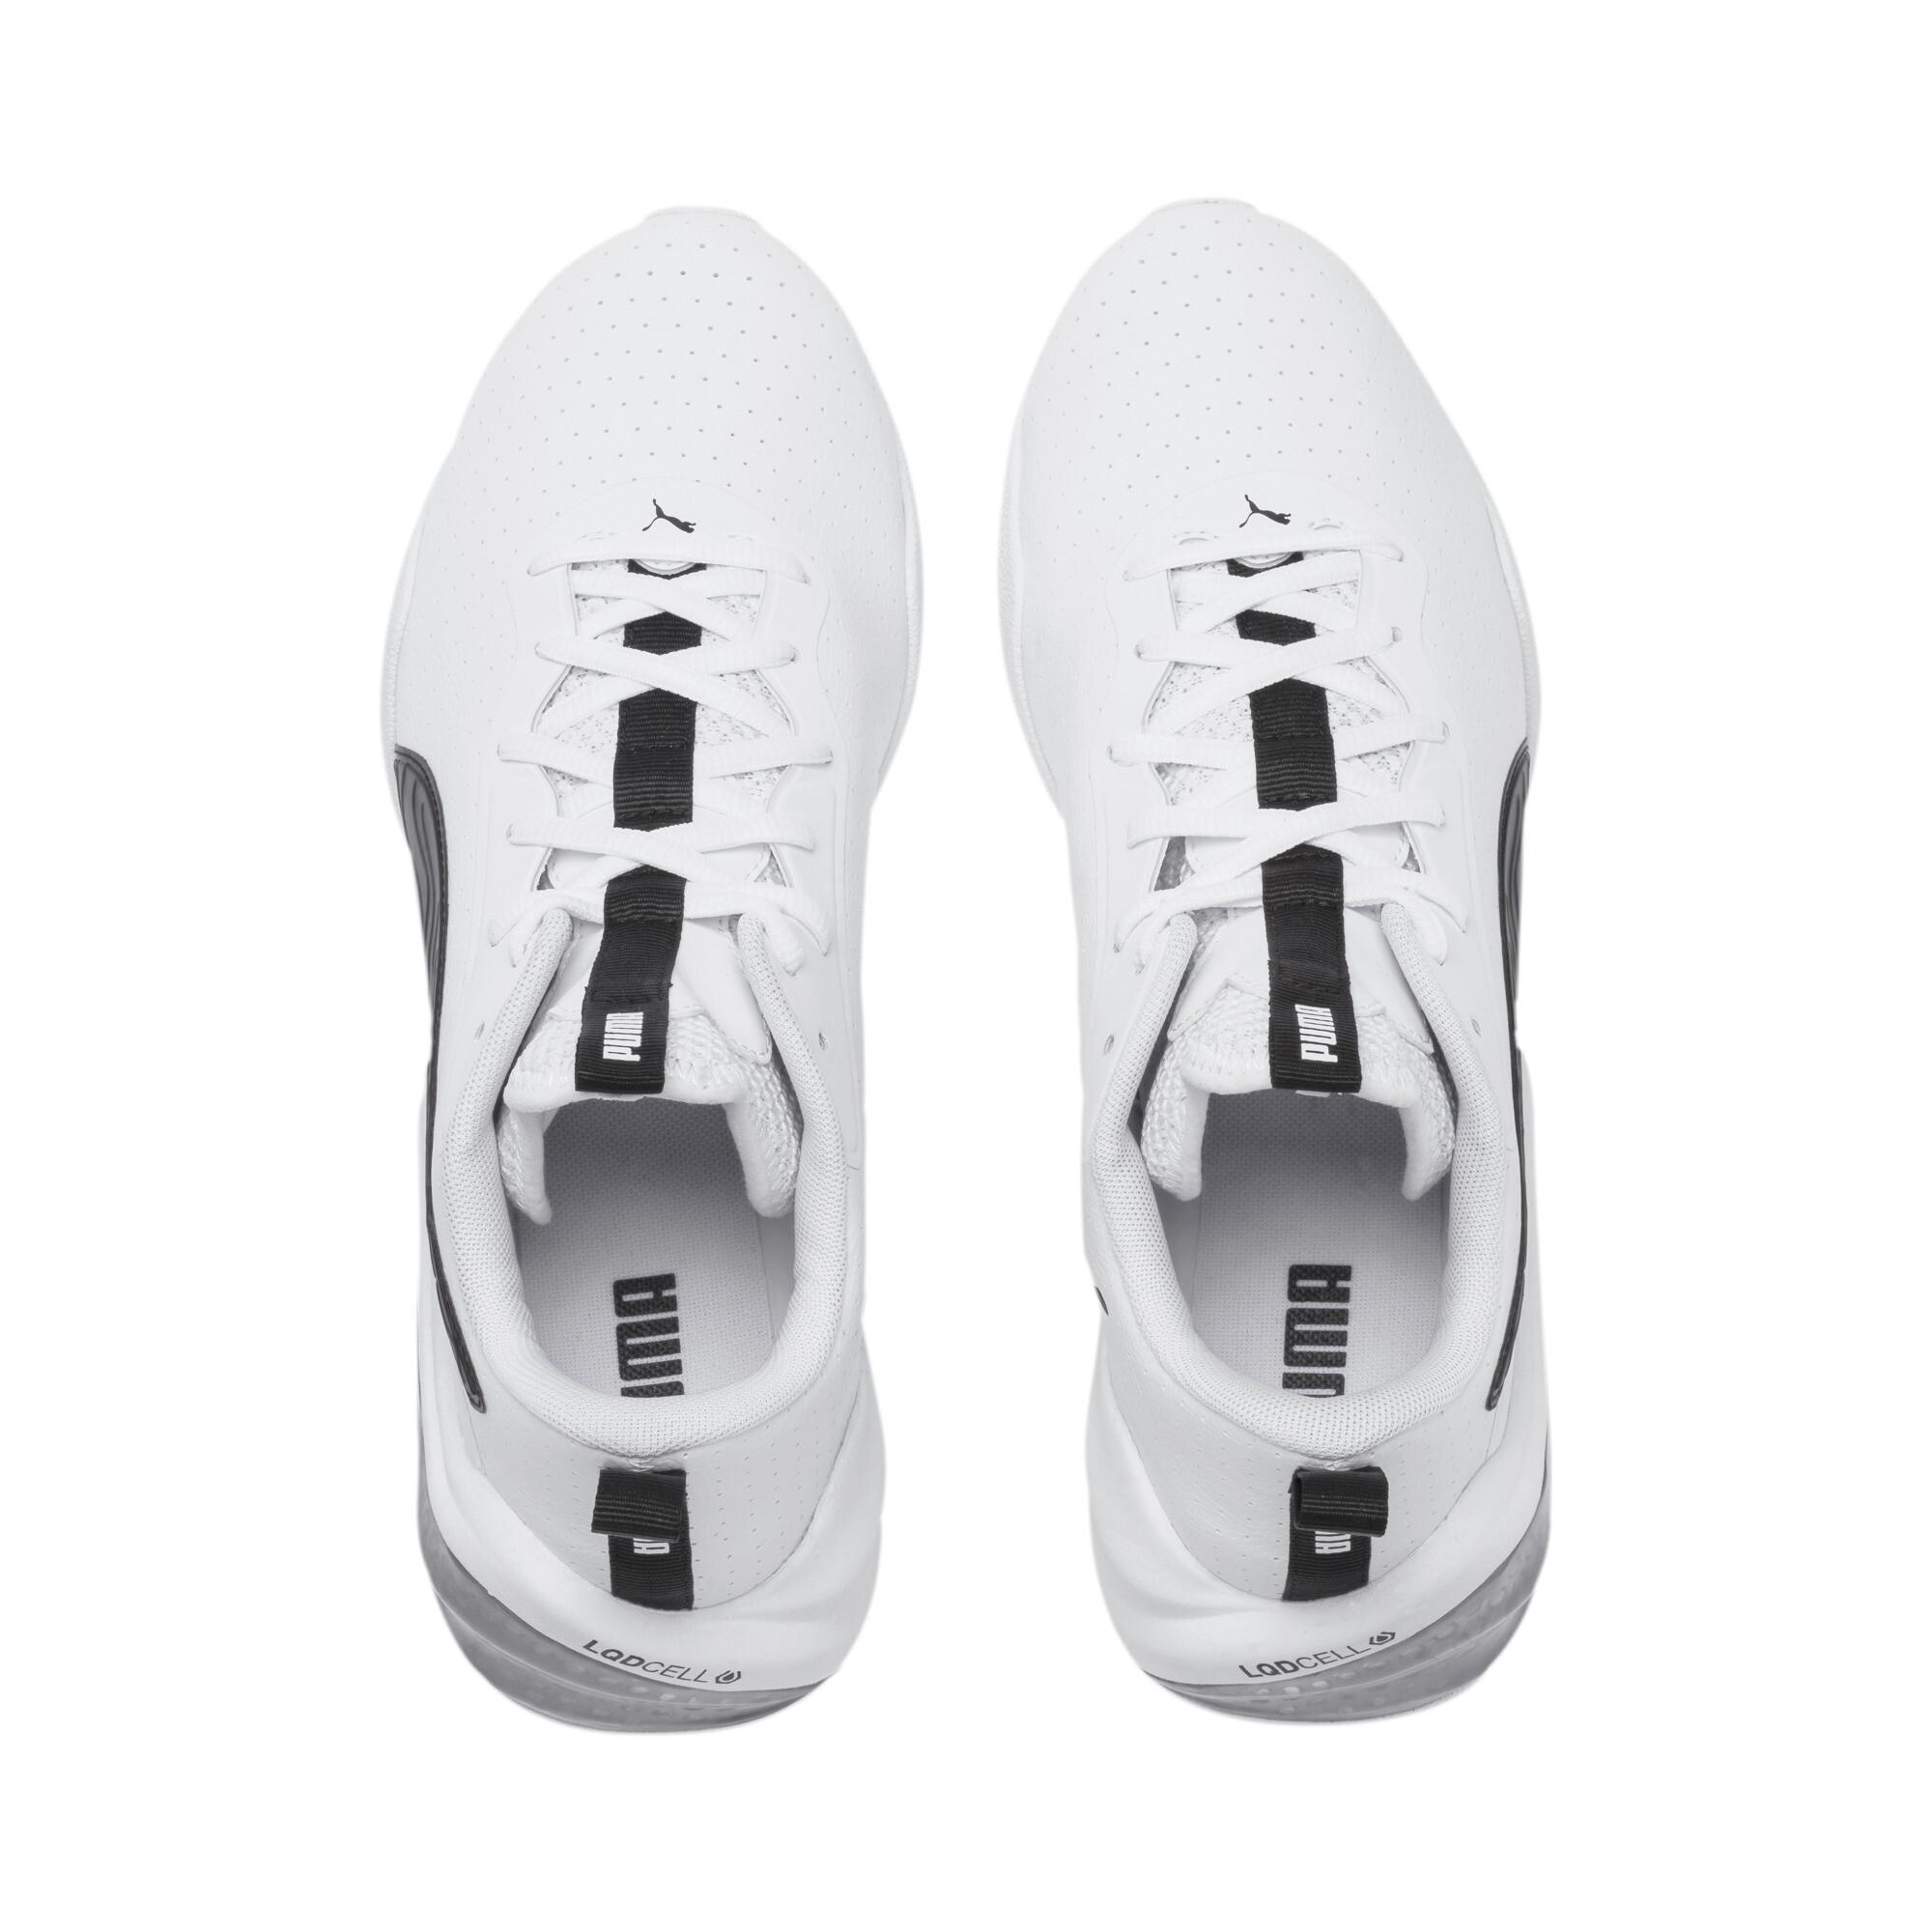 PUMA-Men-039-s-LQDCELL-Challenge-Perf-Training-Shoes thumbnail 8